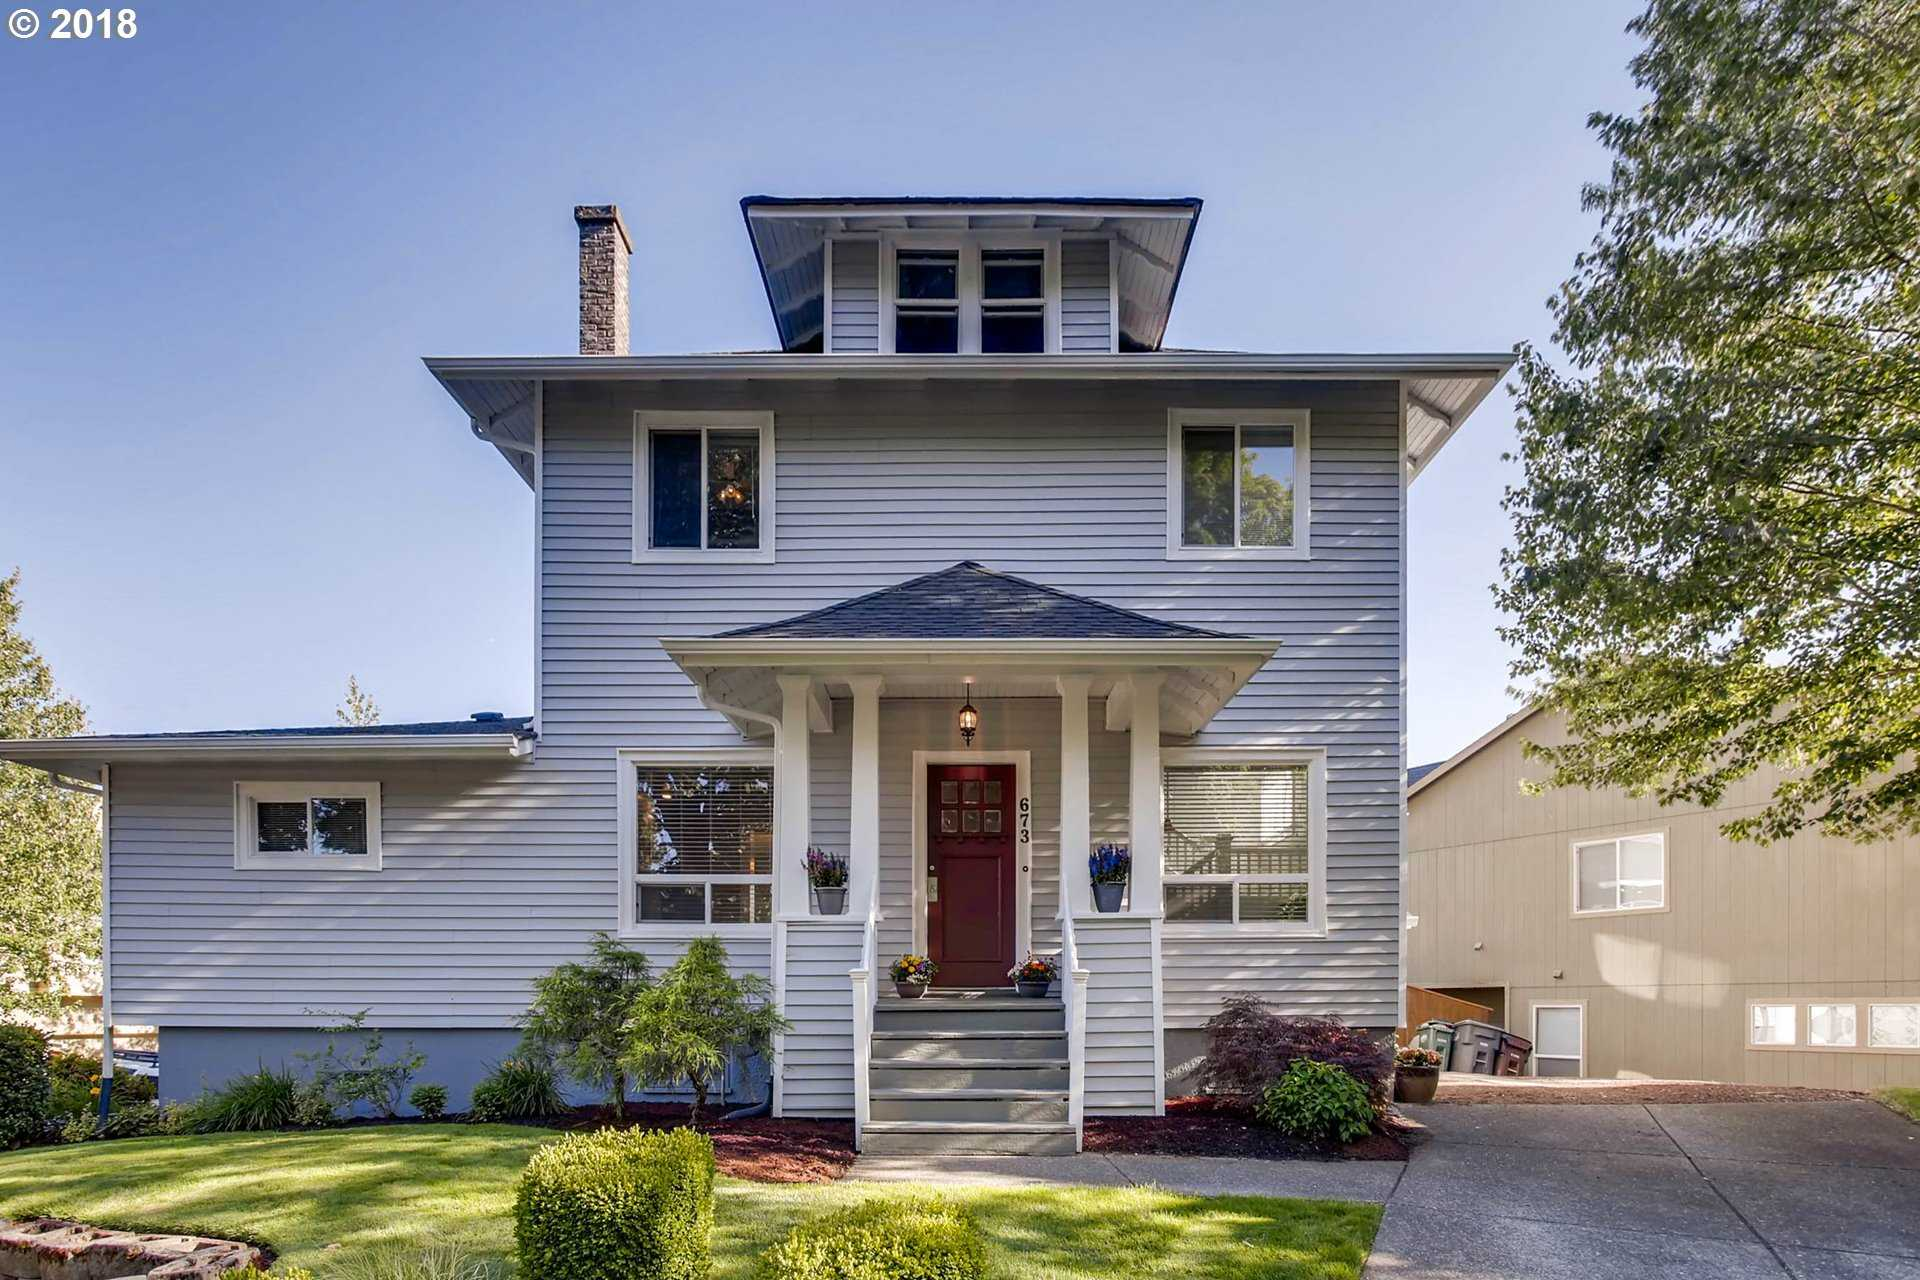 $399,000 - 5Br/3Ba -  for Sale in Hillsboro